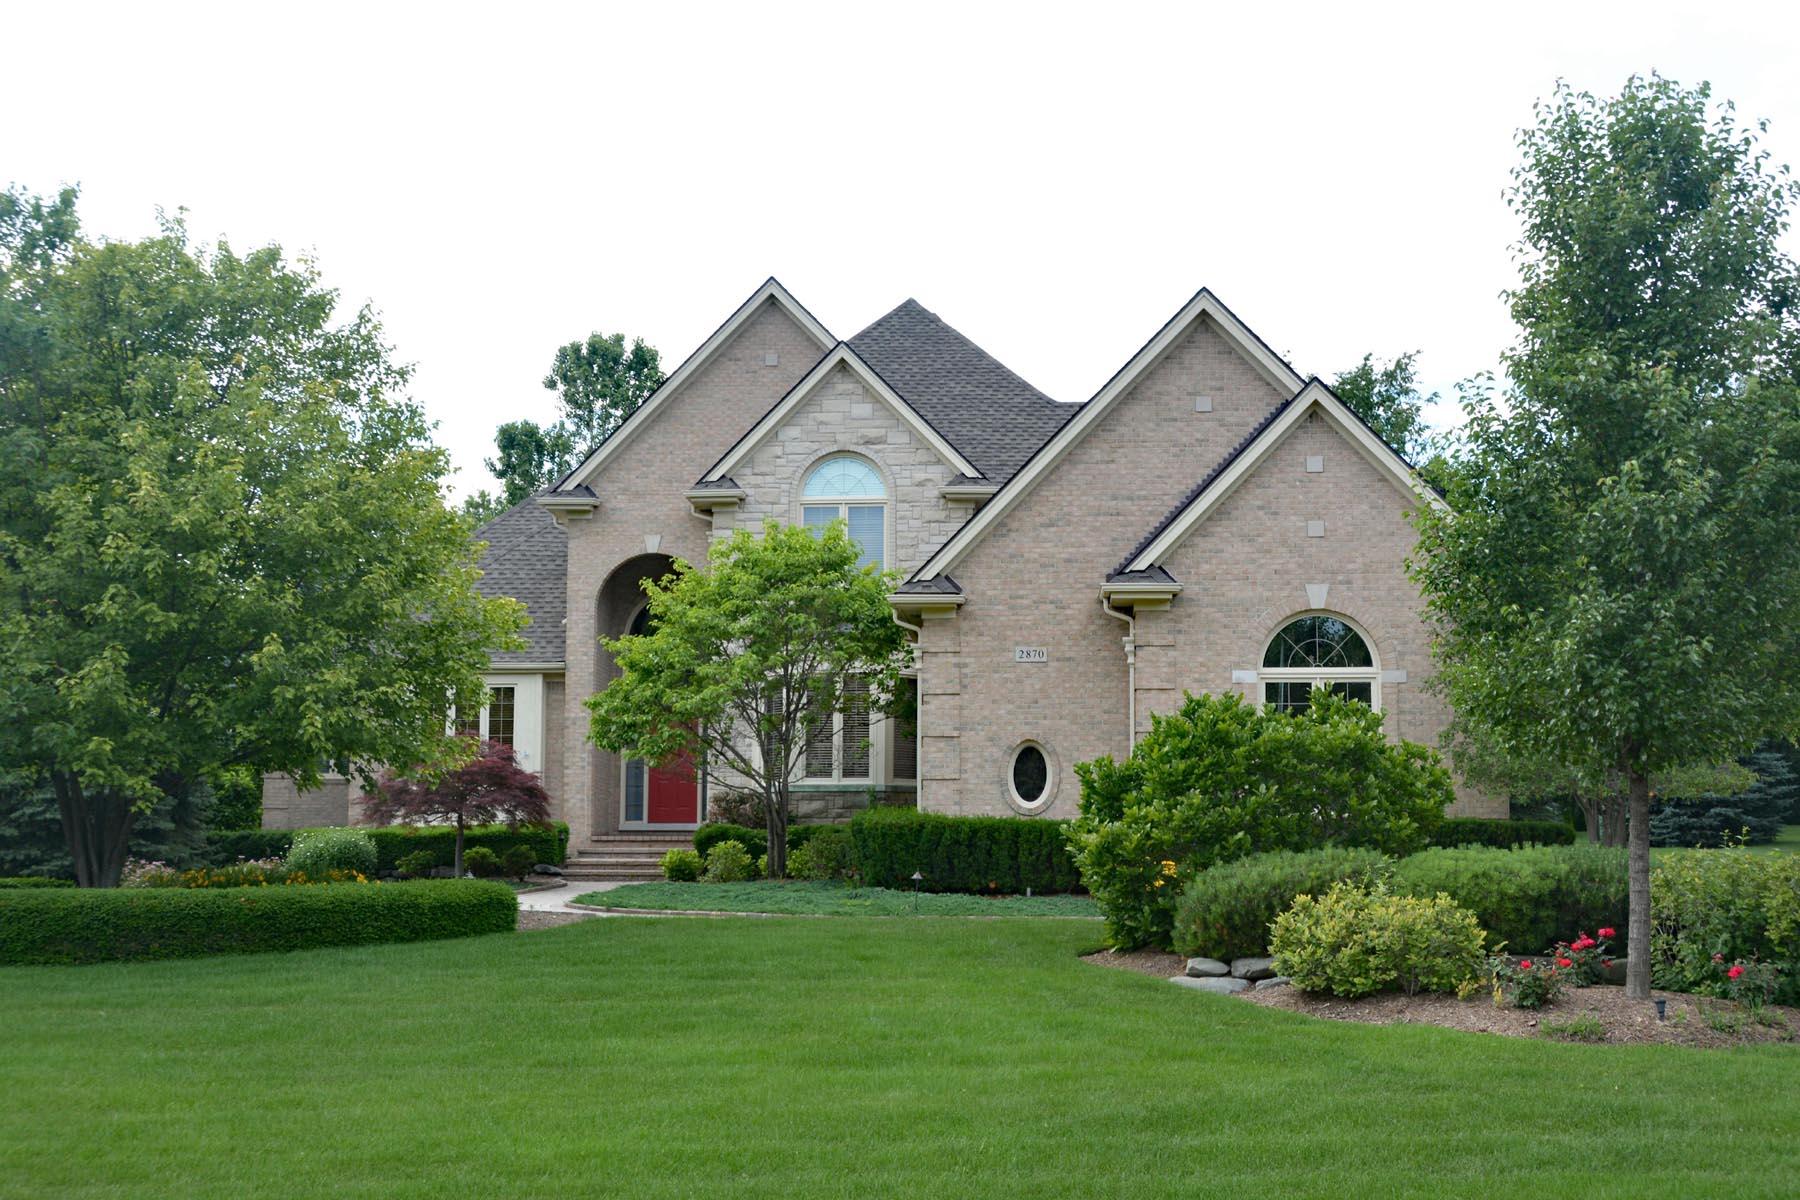 Condominium for Sale at Oakland Township 2870 Plum Creek Oakland Township, Michigan, 48363 United States